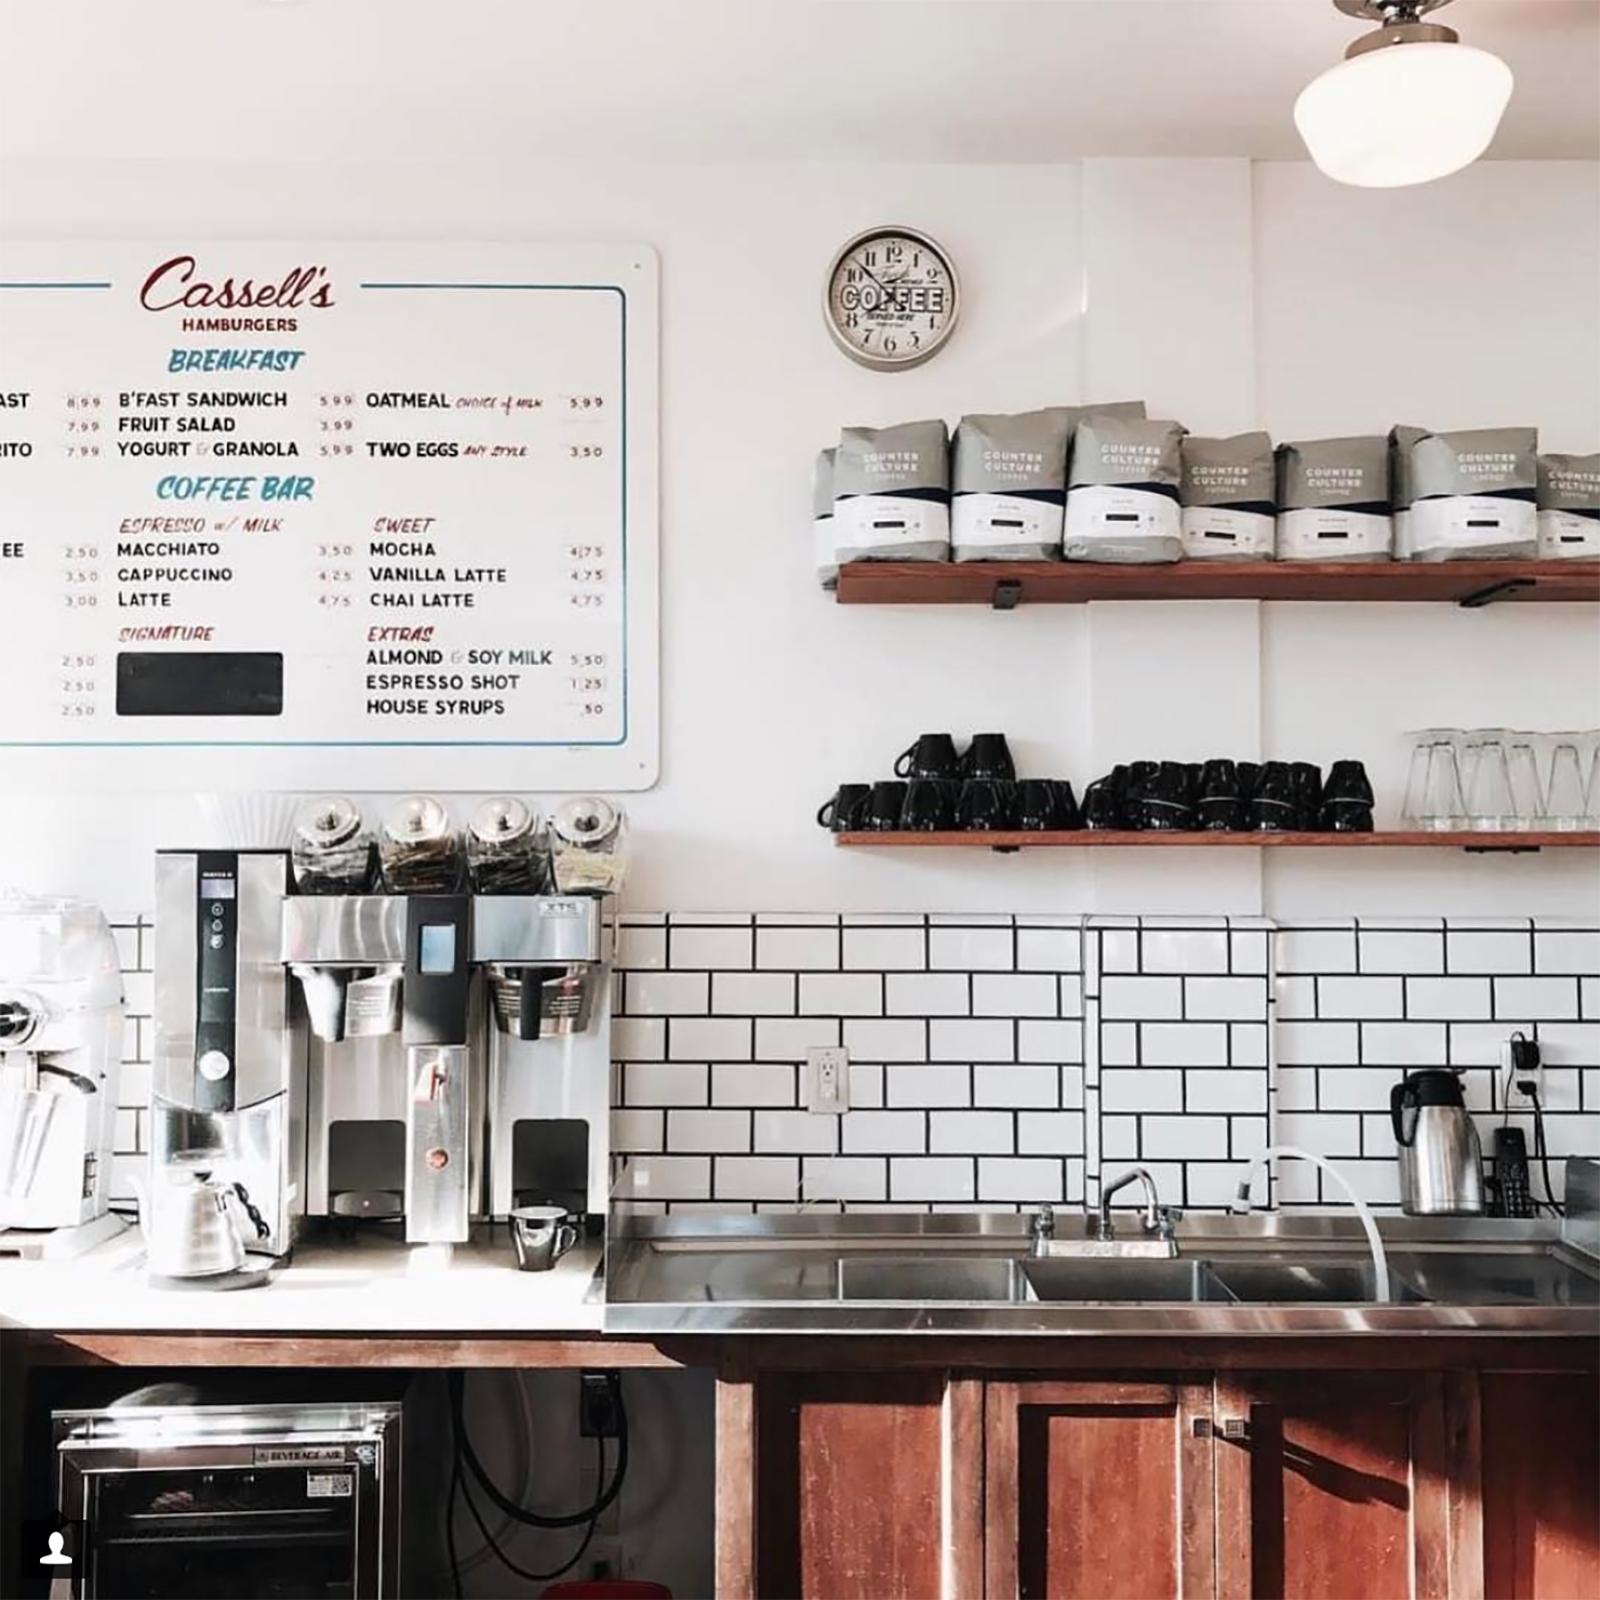 Full Coffee Bar